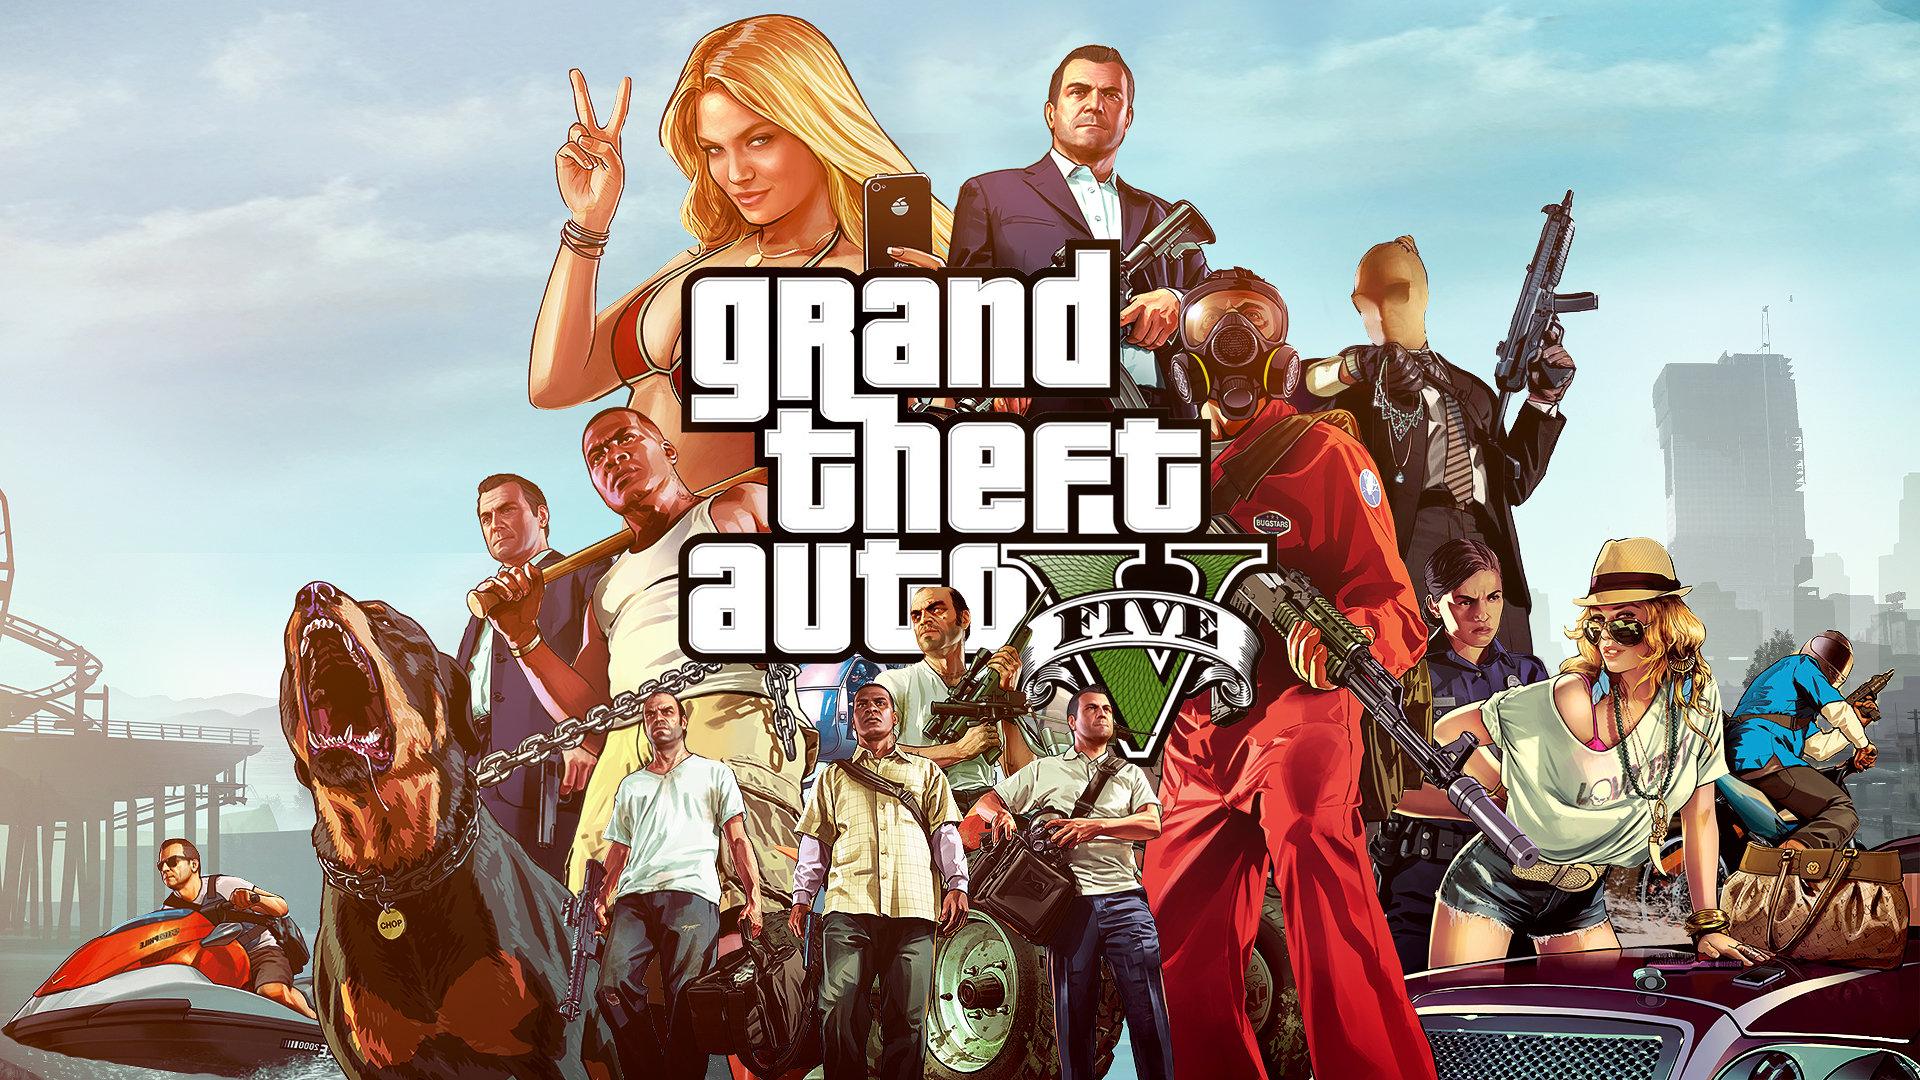 Free Download Grand Theft Auto V GTA 5 Wallpaper ID195027 Full Hd For Computer